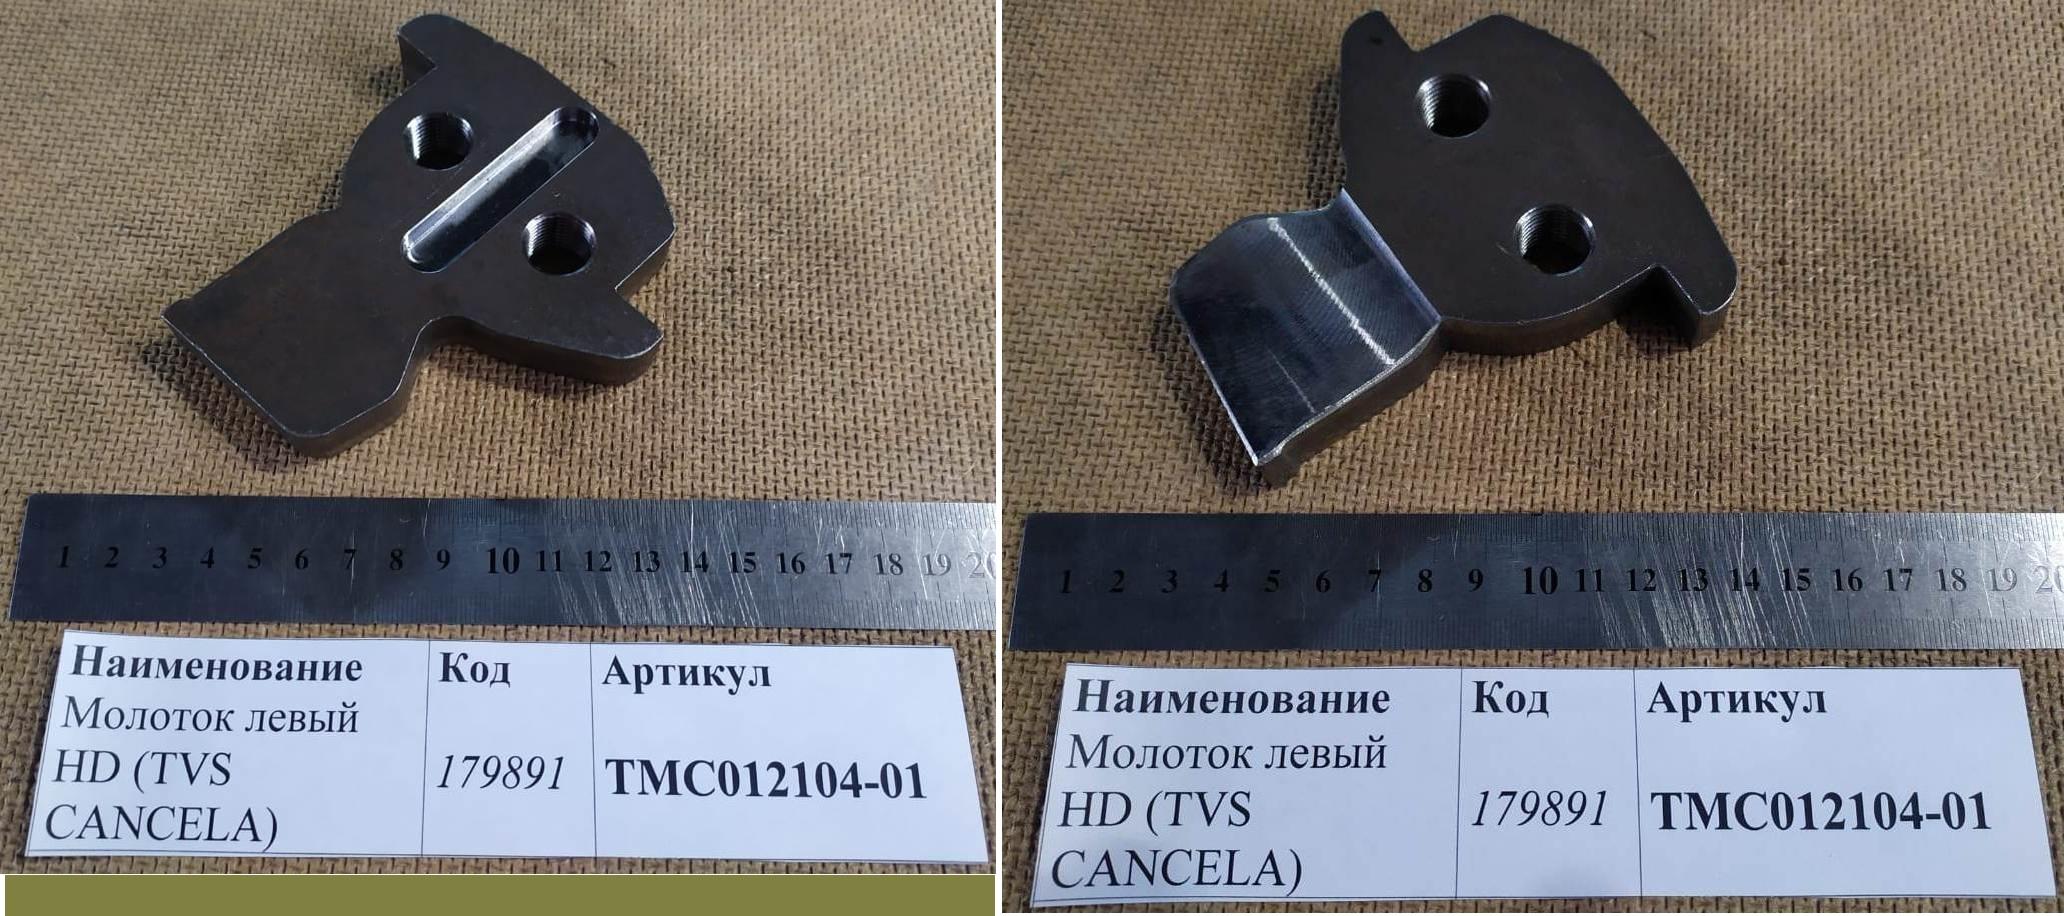 Молоток левый HD (TVS CANCELA)